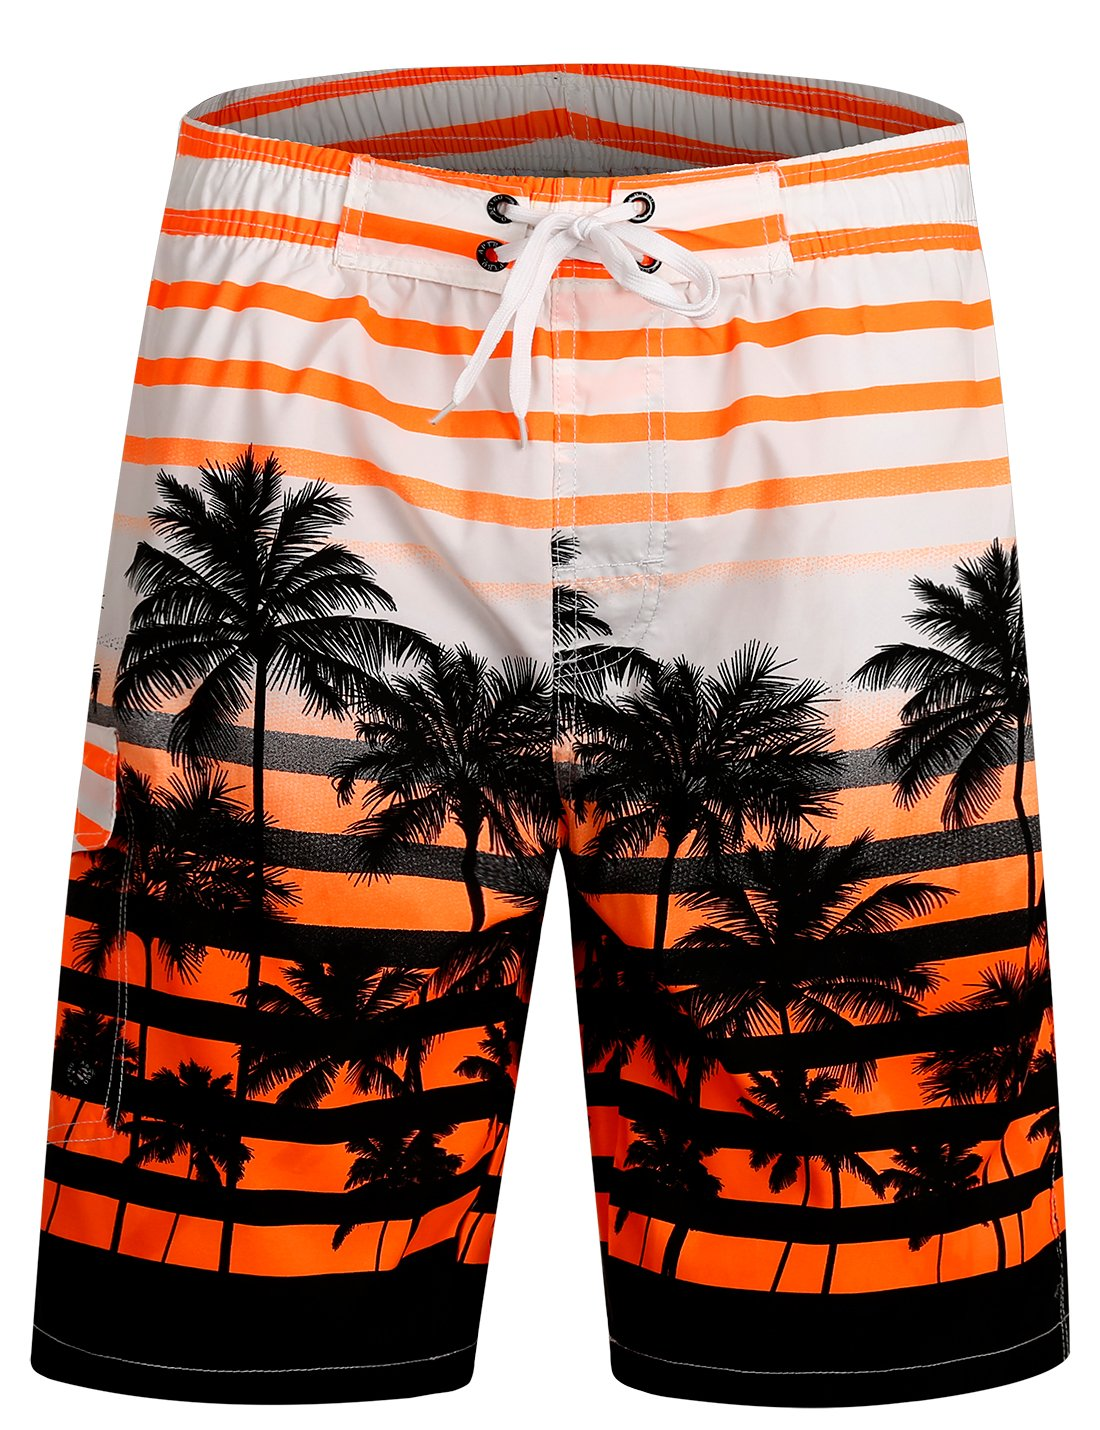 69cec3693859a Best Rated in Men s Recreational Swimwear   Helpful Customer Reviews ...